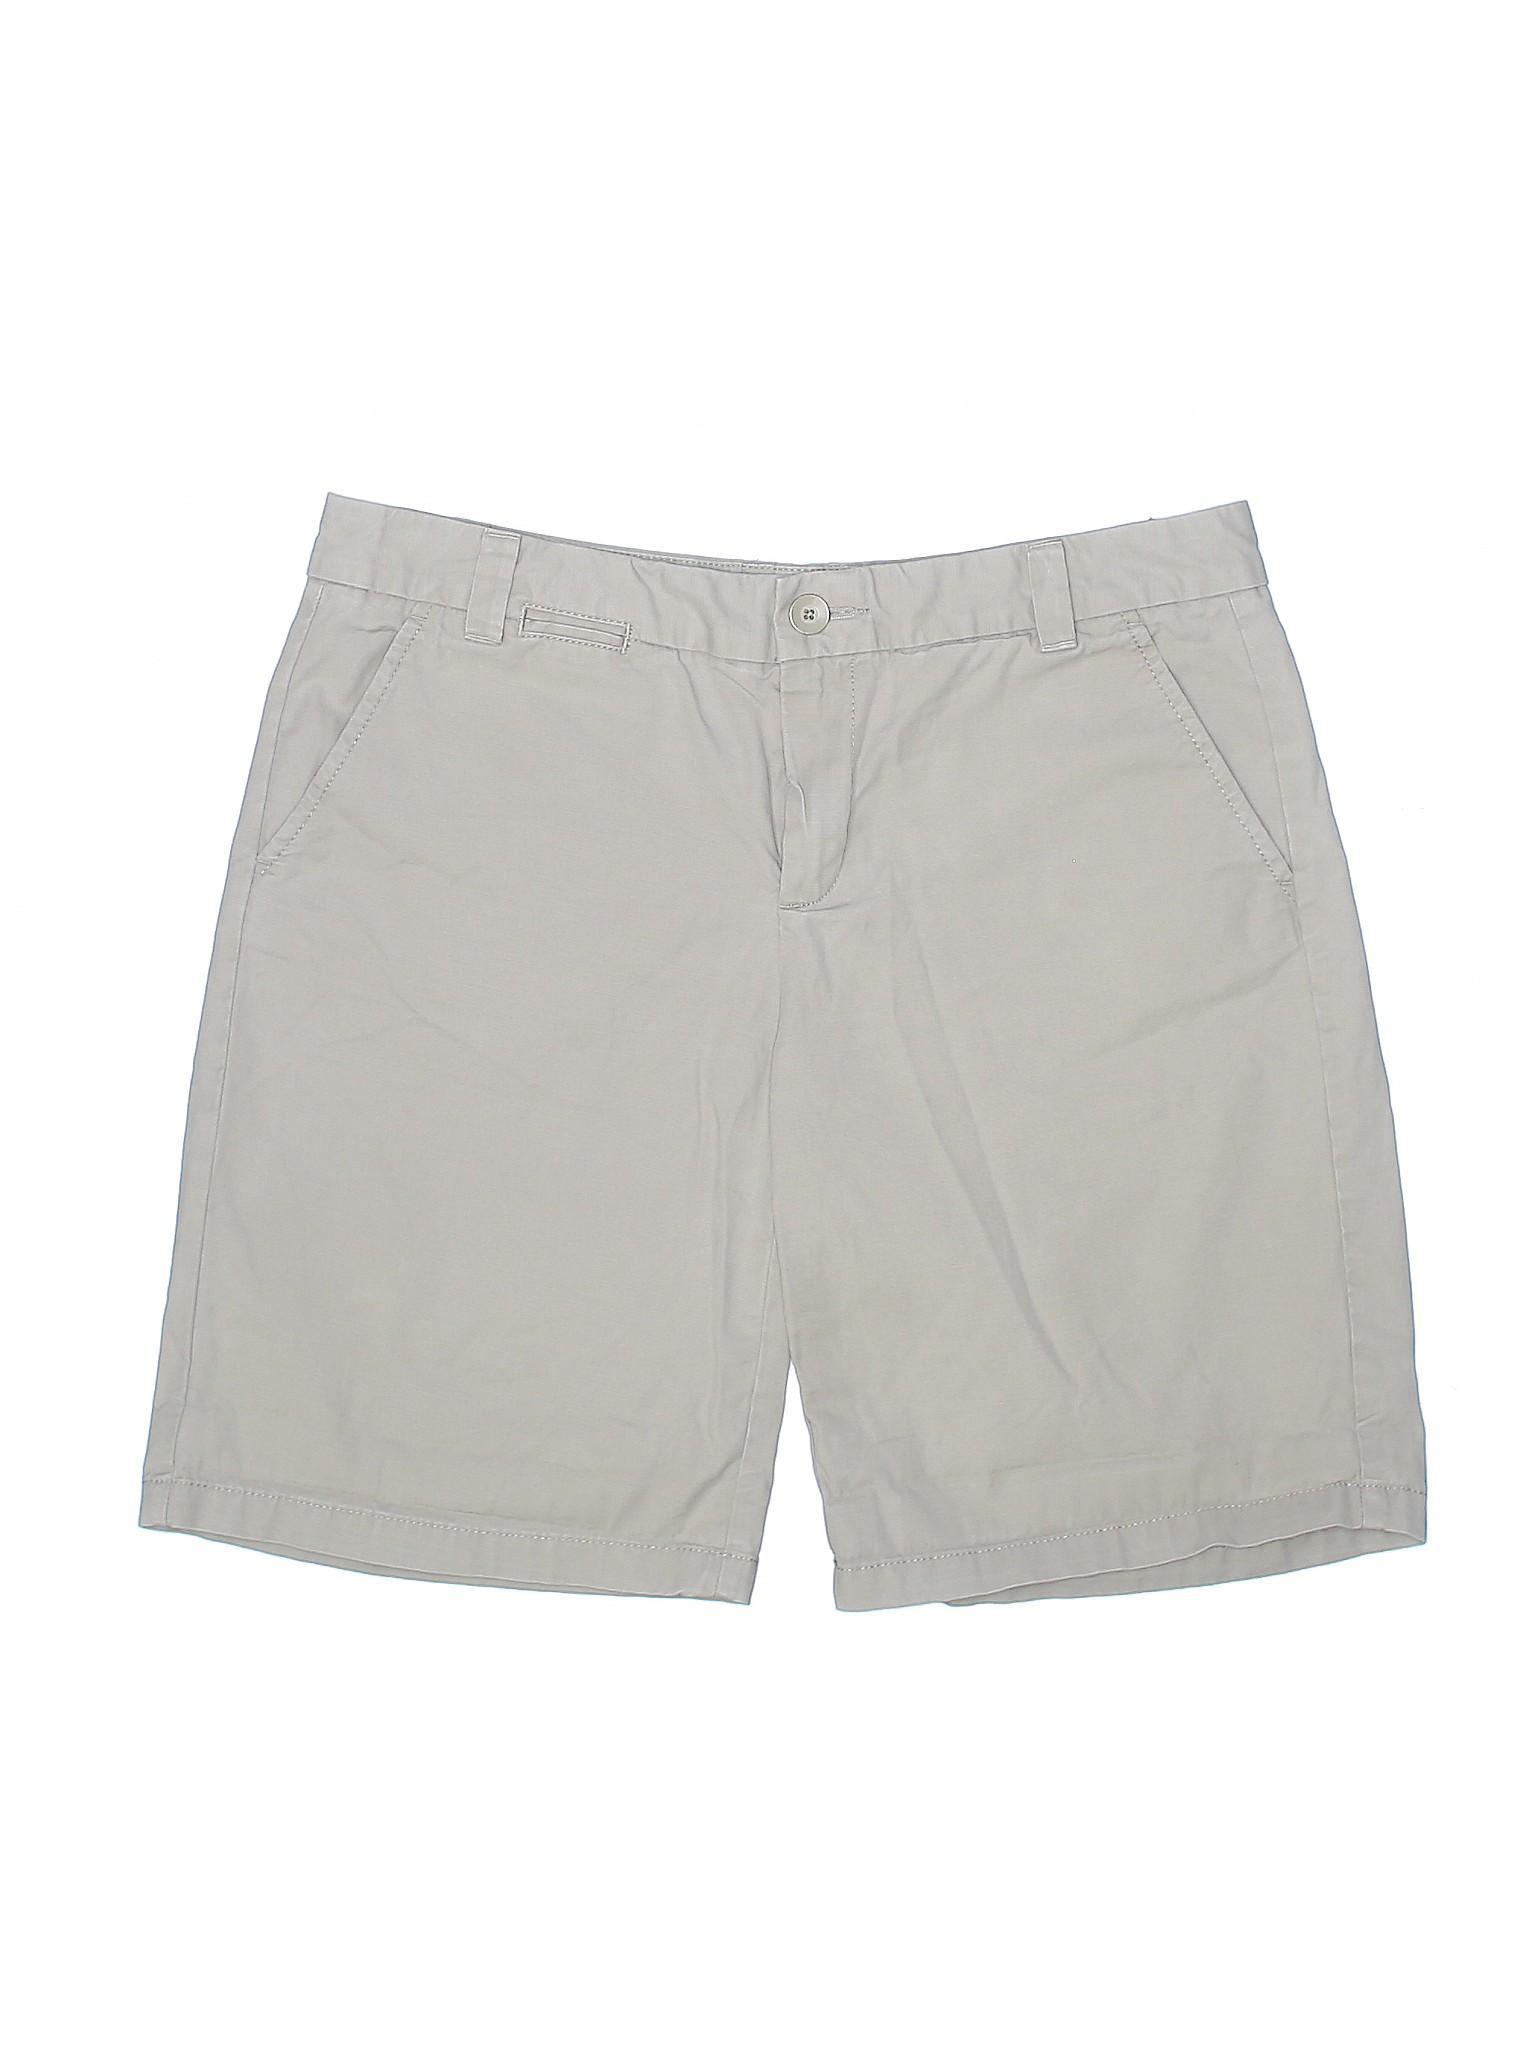 winter Shorts Boutique Khaki Boutique Gap winter RwqPO